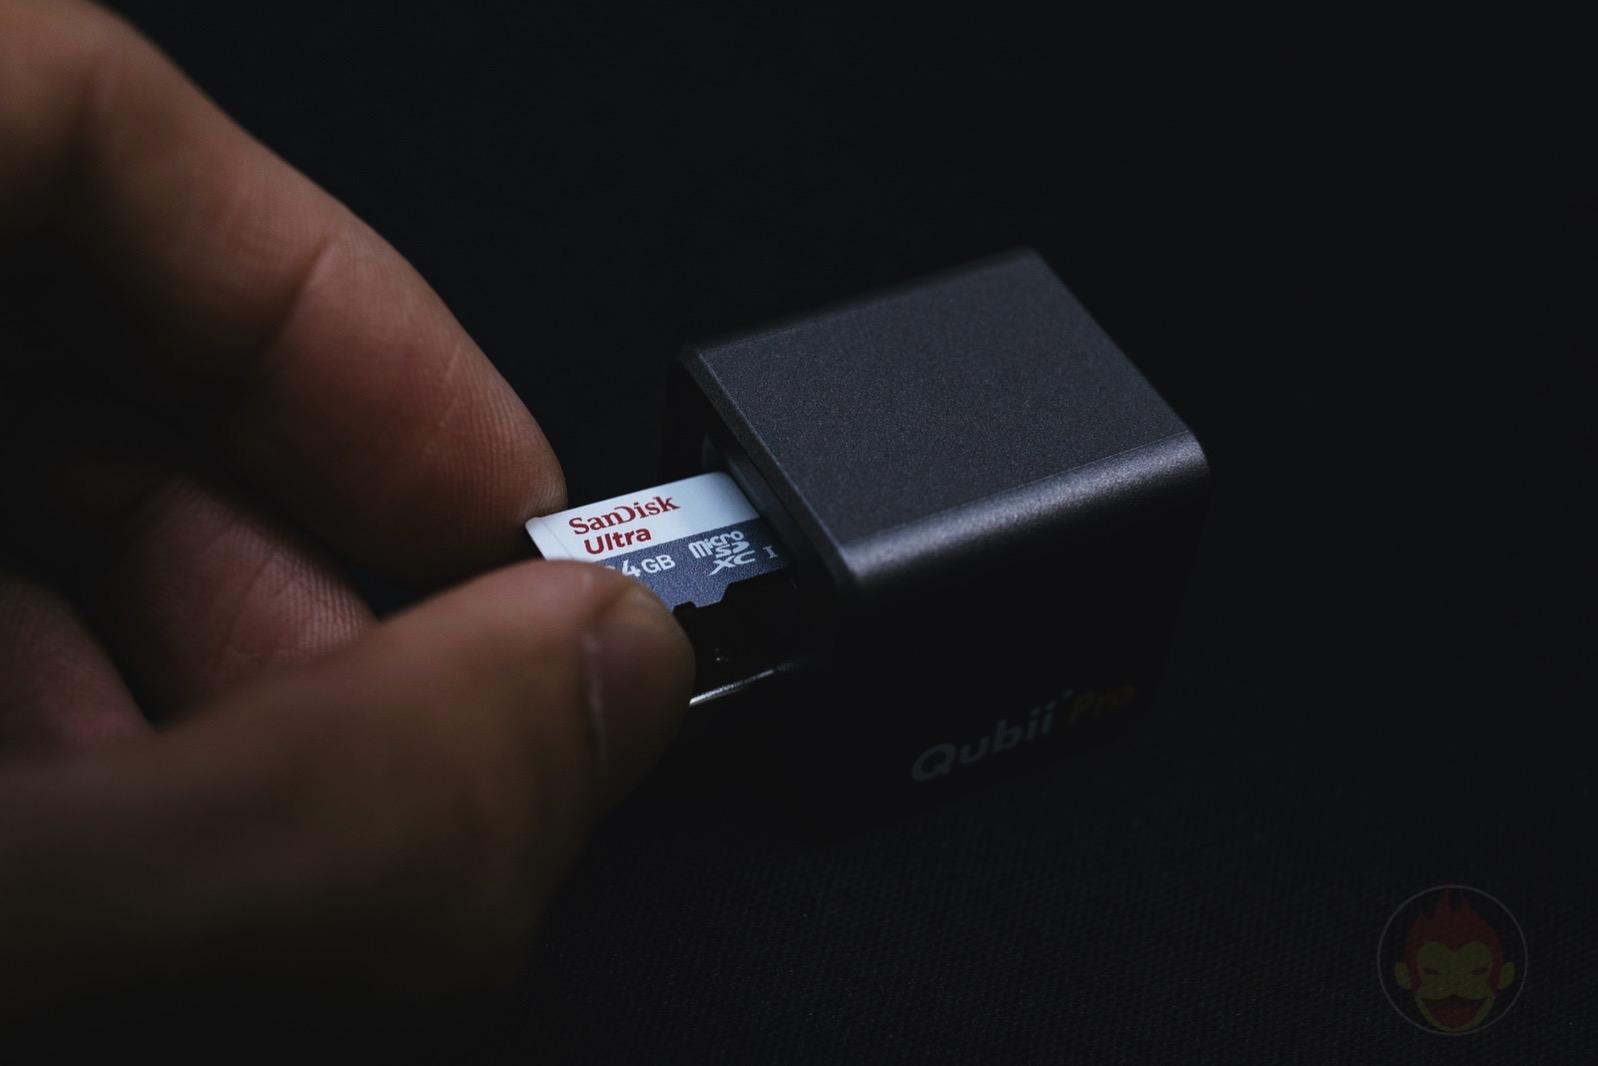 Qubii-Pro-Review-04.jpg